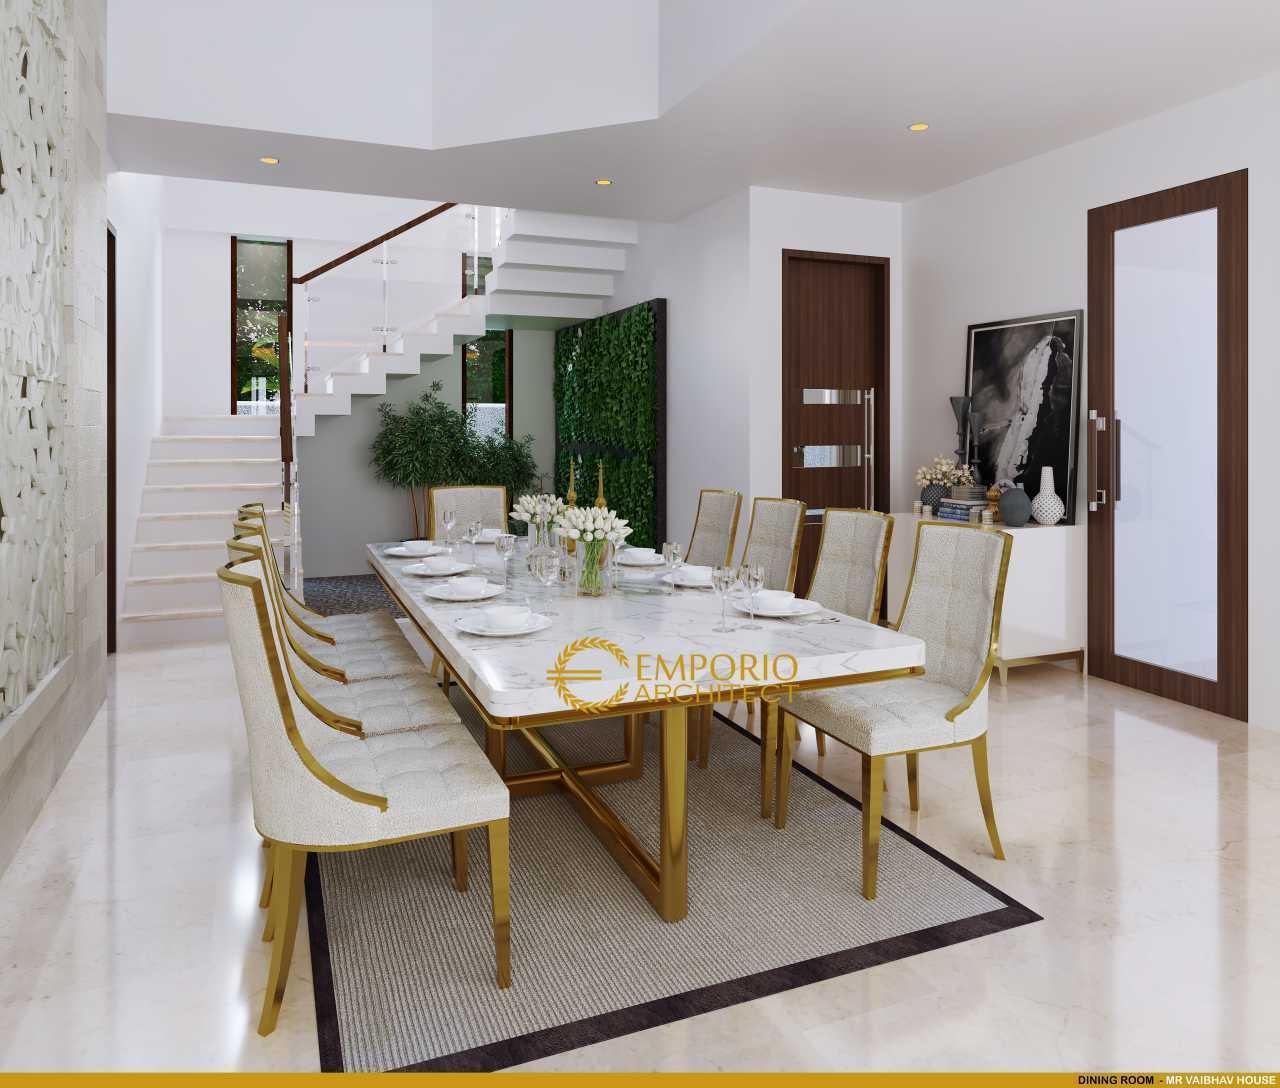 Emporio Architect Jasa Arsitek India Desain Rumah Villa Bali 2 Lantai 724 @ India India India Emporio-Architect-Jasa-Arsitek-India-Desain-Rumah-Villa-Bali-2-Lantai-724-India  93943